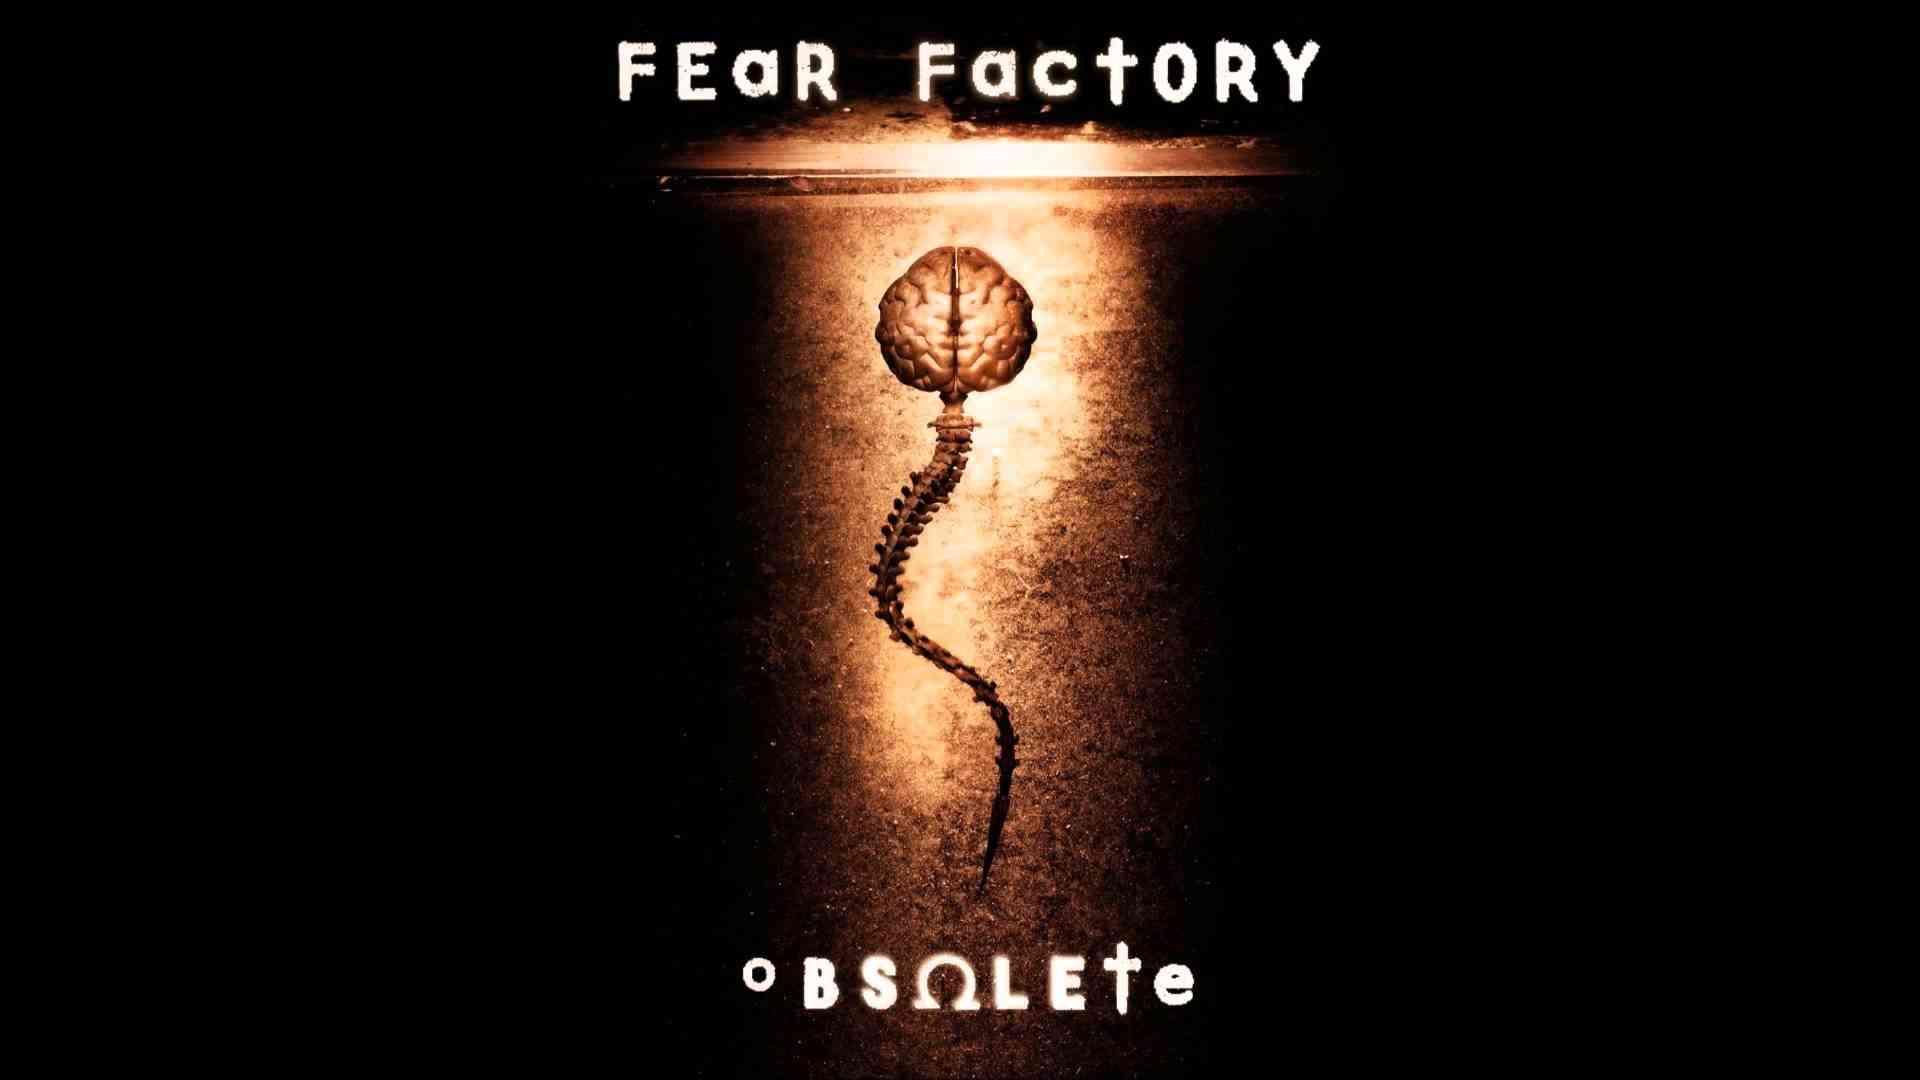 Fear Factory - Obsolete [Full Album Digipak] - YouTube